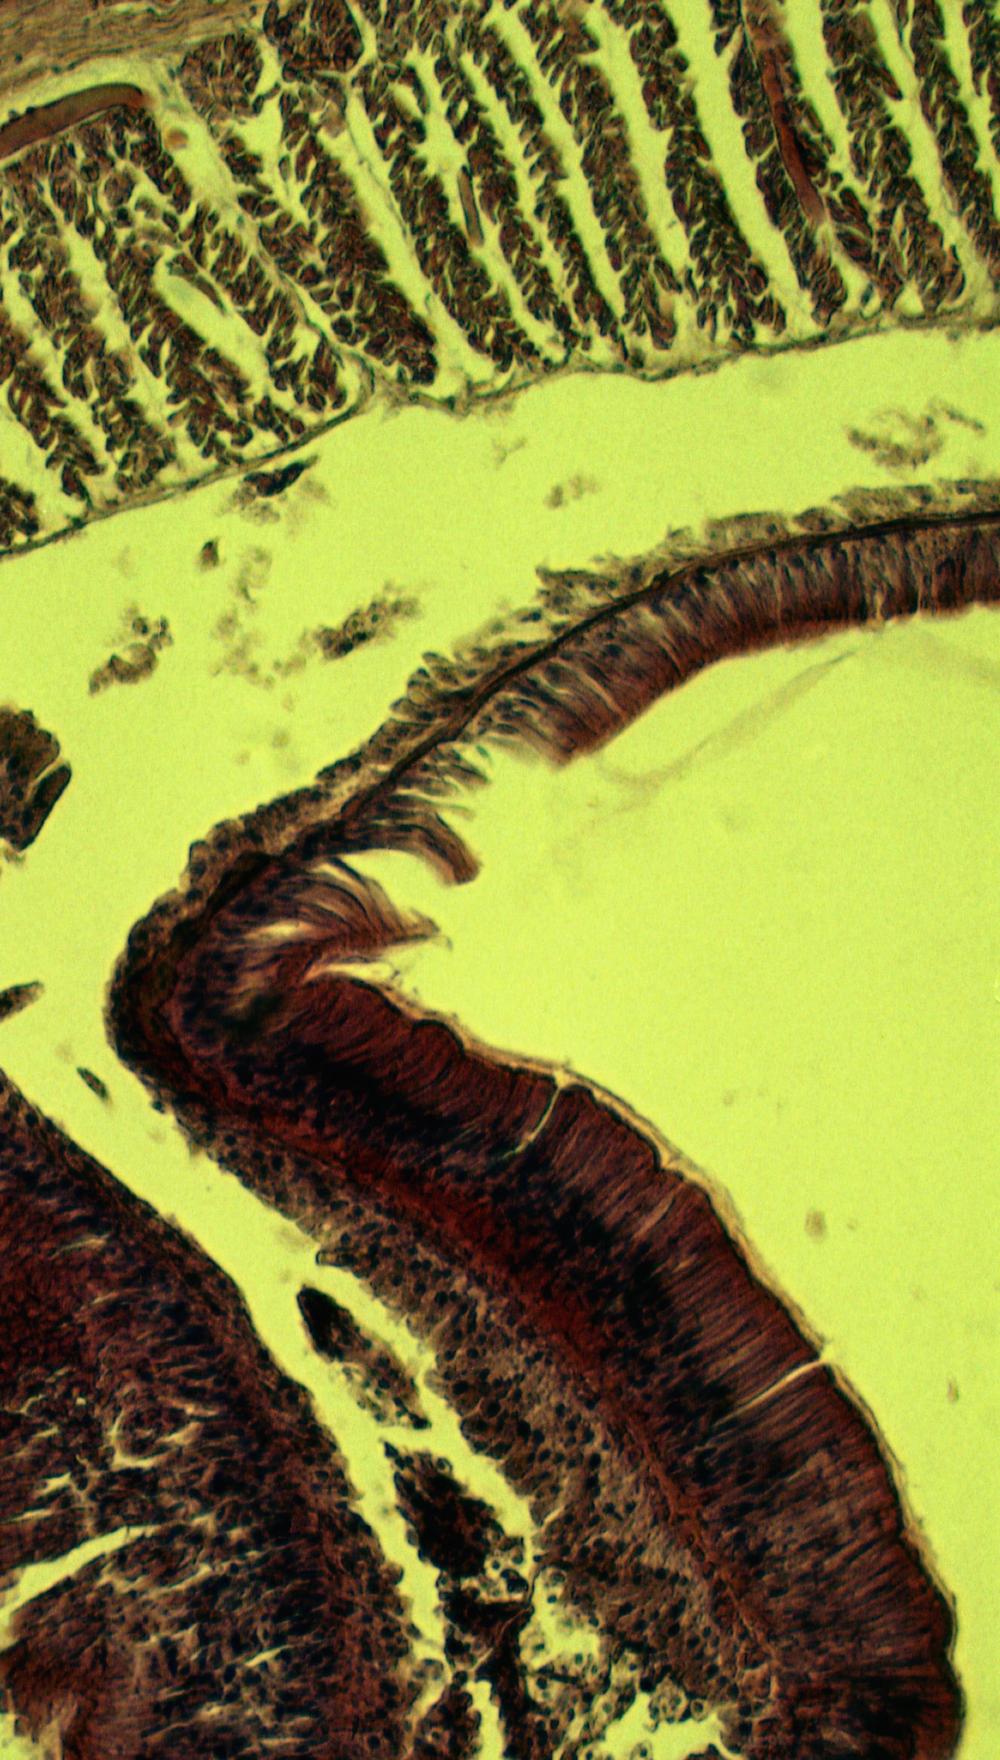 Common earthworm (Lumbricus terrestris): Cross-section